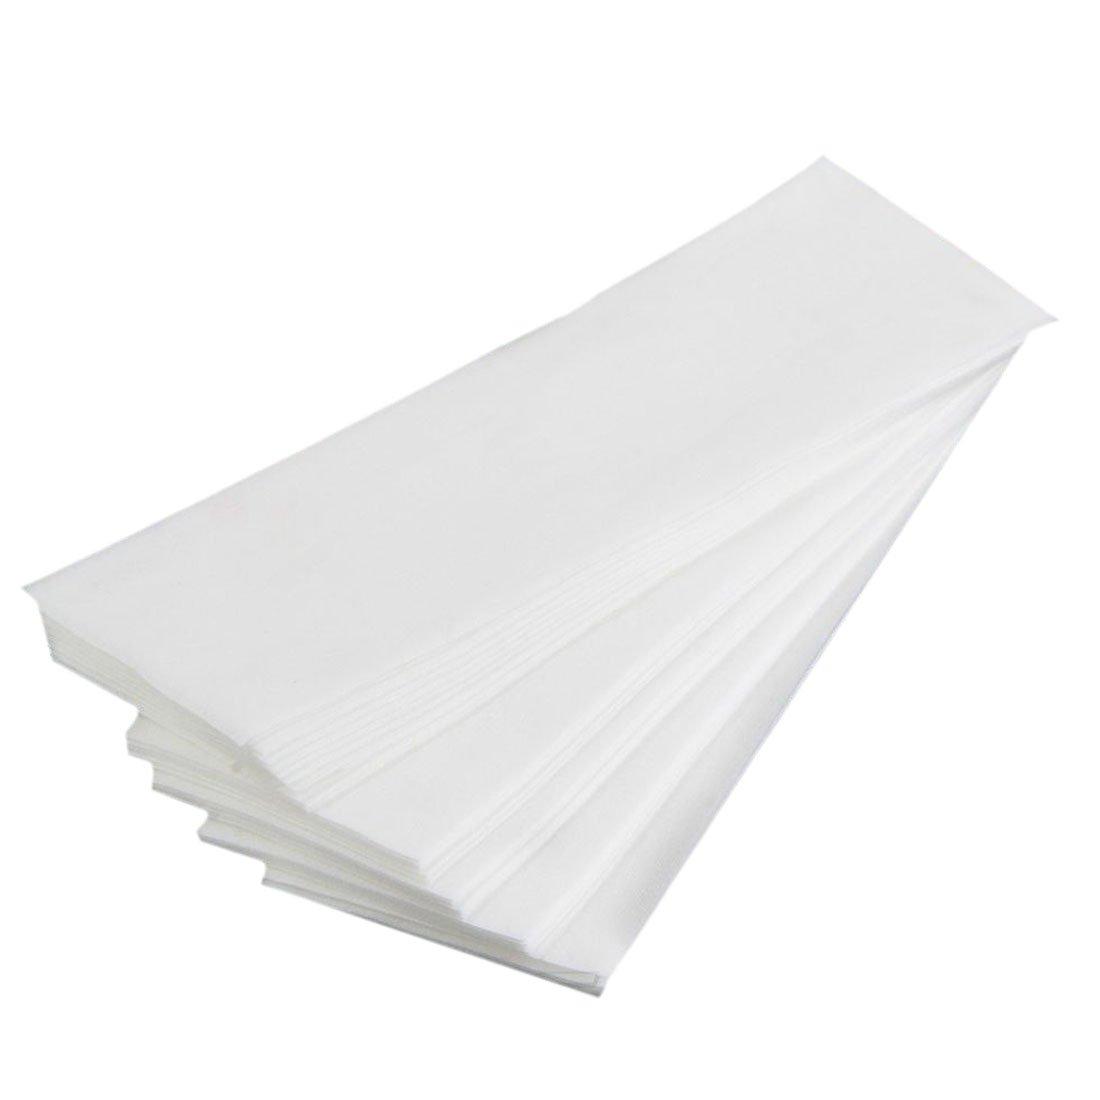 Bandas depilatorias, 100 unidades, de papel CY-Buity